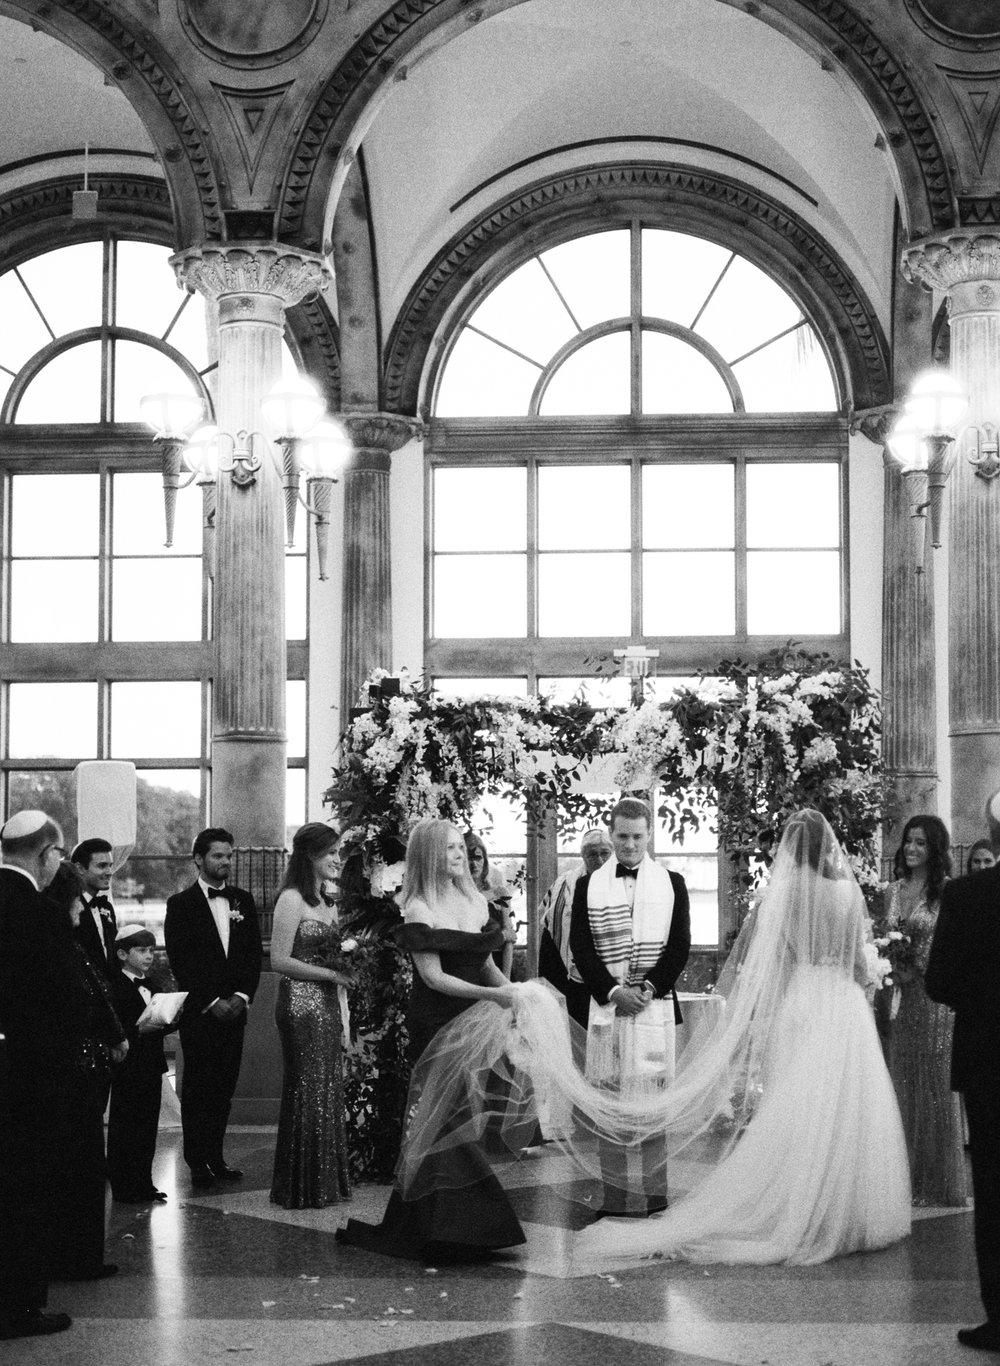 Marissa-Jon-Wedding-Ceremony-062.jpg